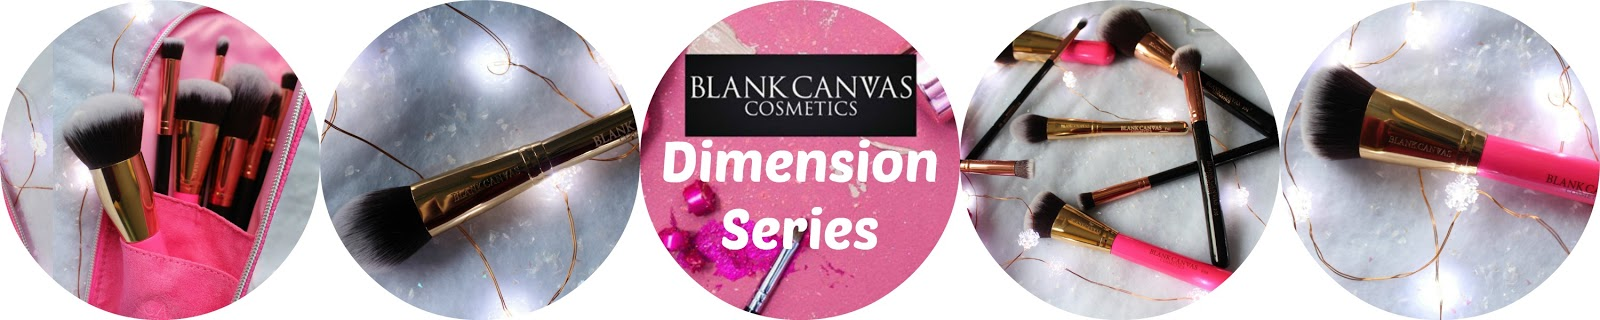 Blank Canvas Cosmetics Dimension Series